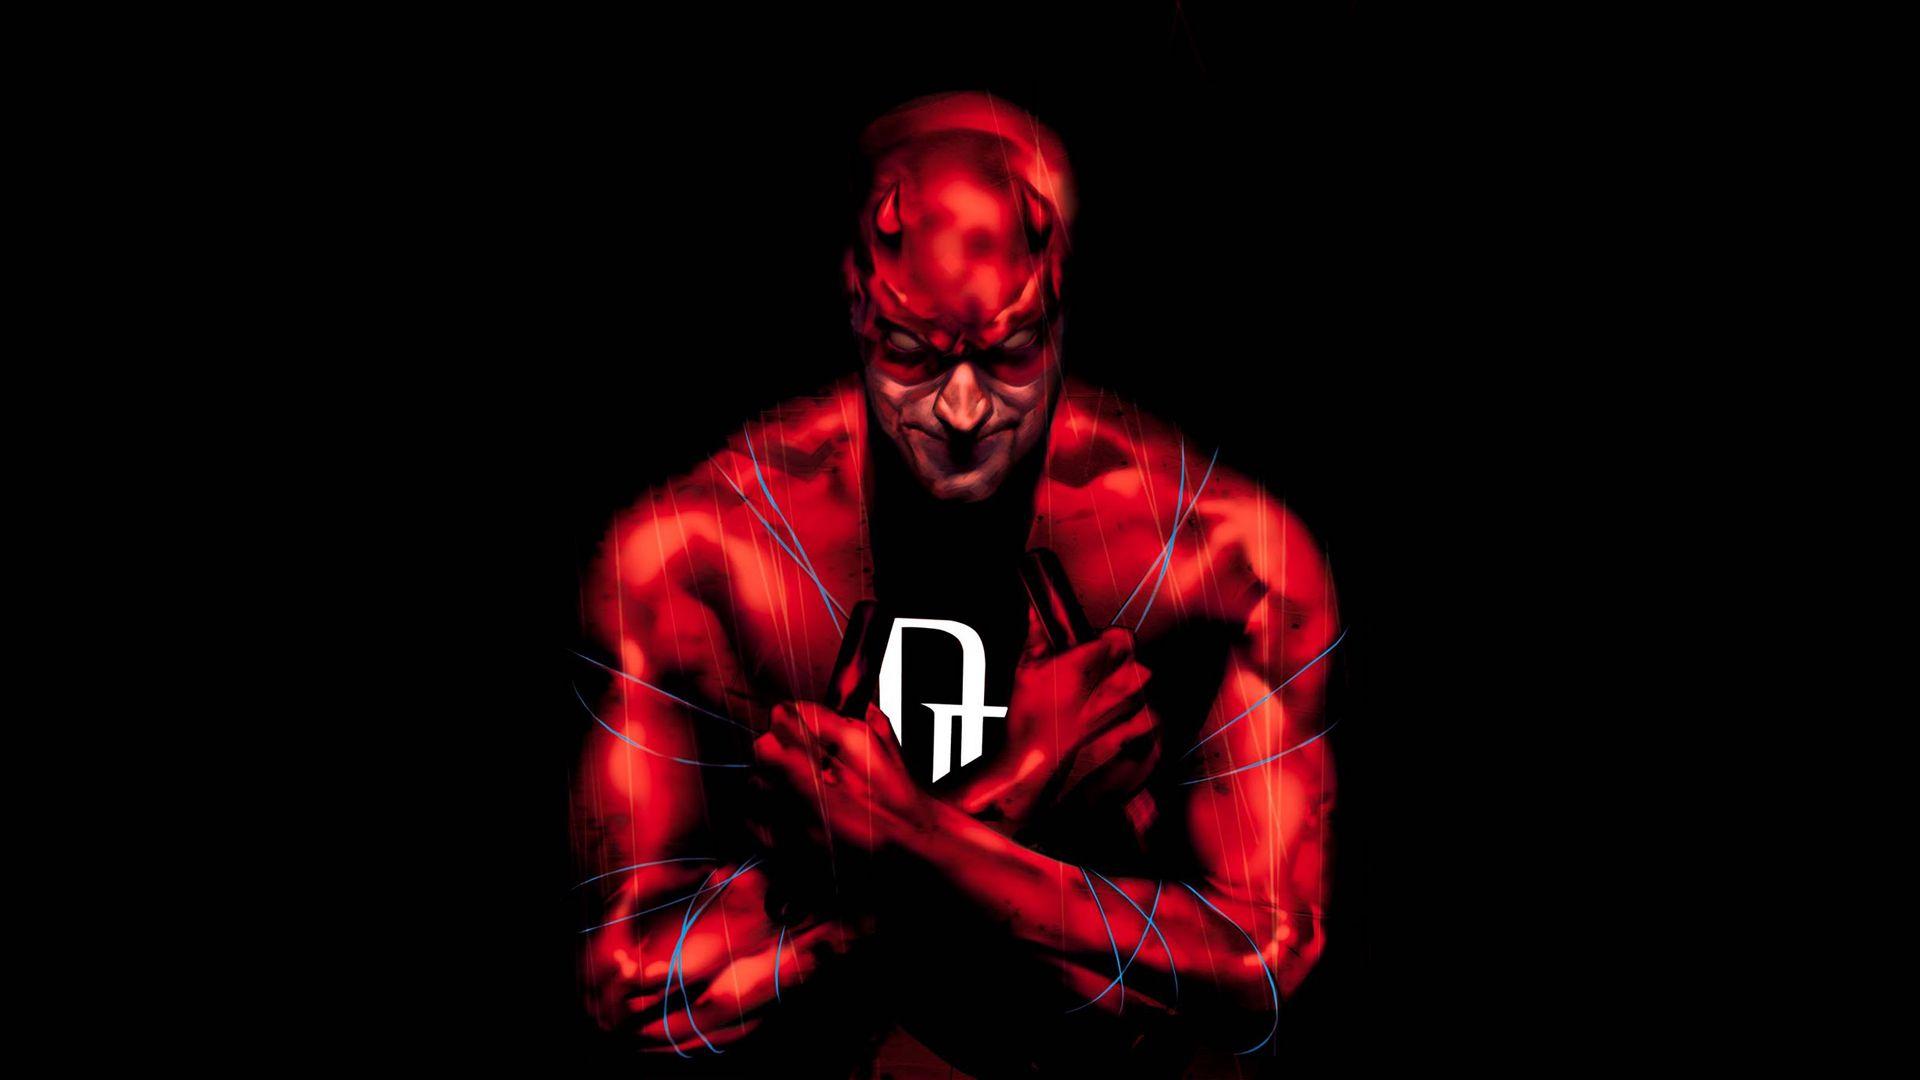 17 daredevil marvel superhero wallpaper hd collections - yoanu